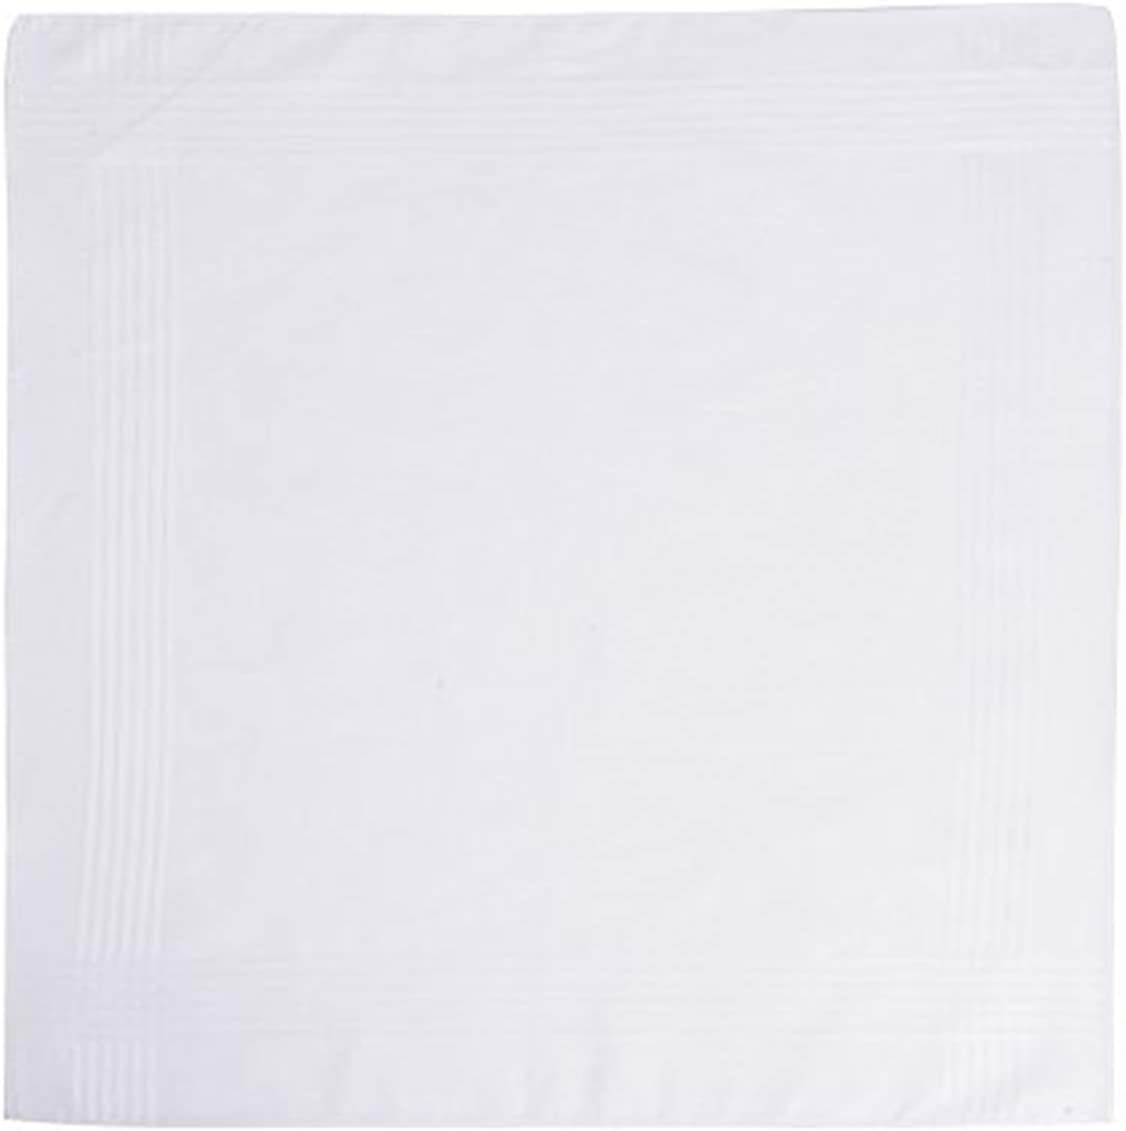 Mens Handkerchiefs 100/% Cotton White Pack of 12,Plain